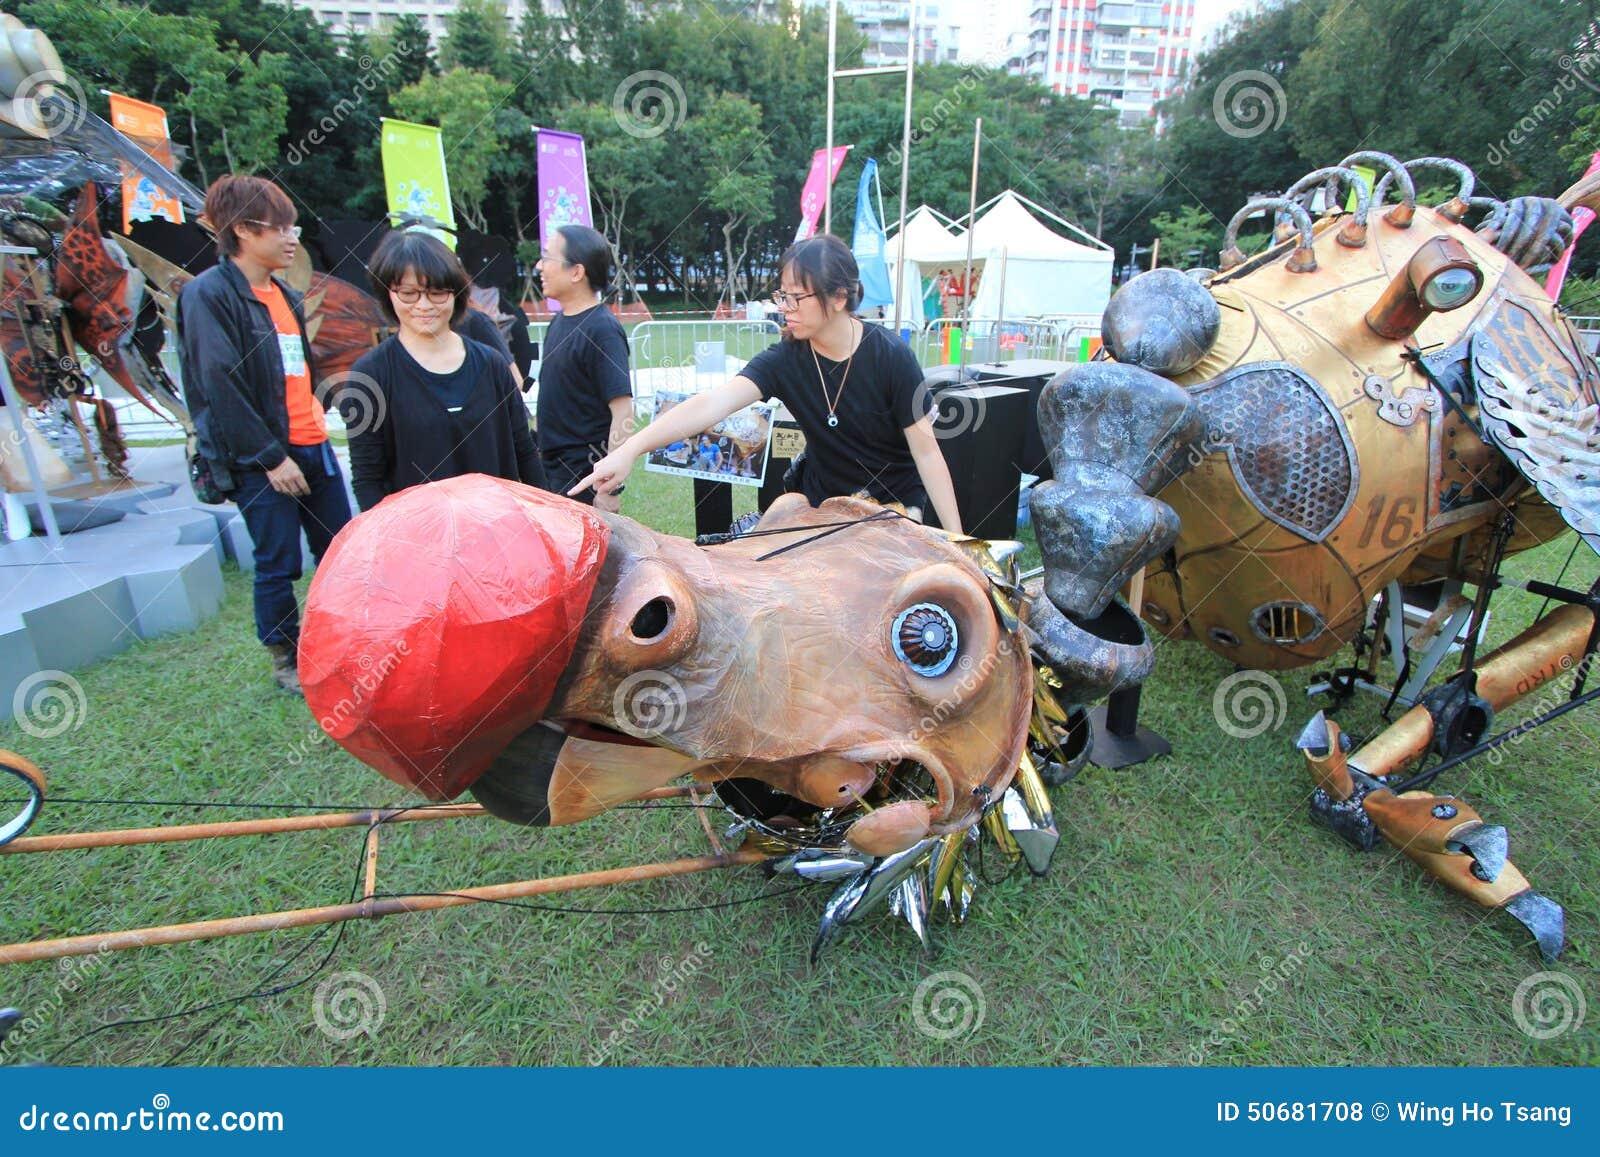 Download 艺术事件在公园狂欢节的在香港 编辑类库存照片. 图片 包括有 公园, 浮动, pensacola, 纵酒狂饮 - 50681708